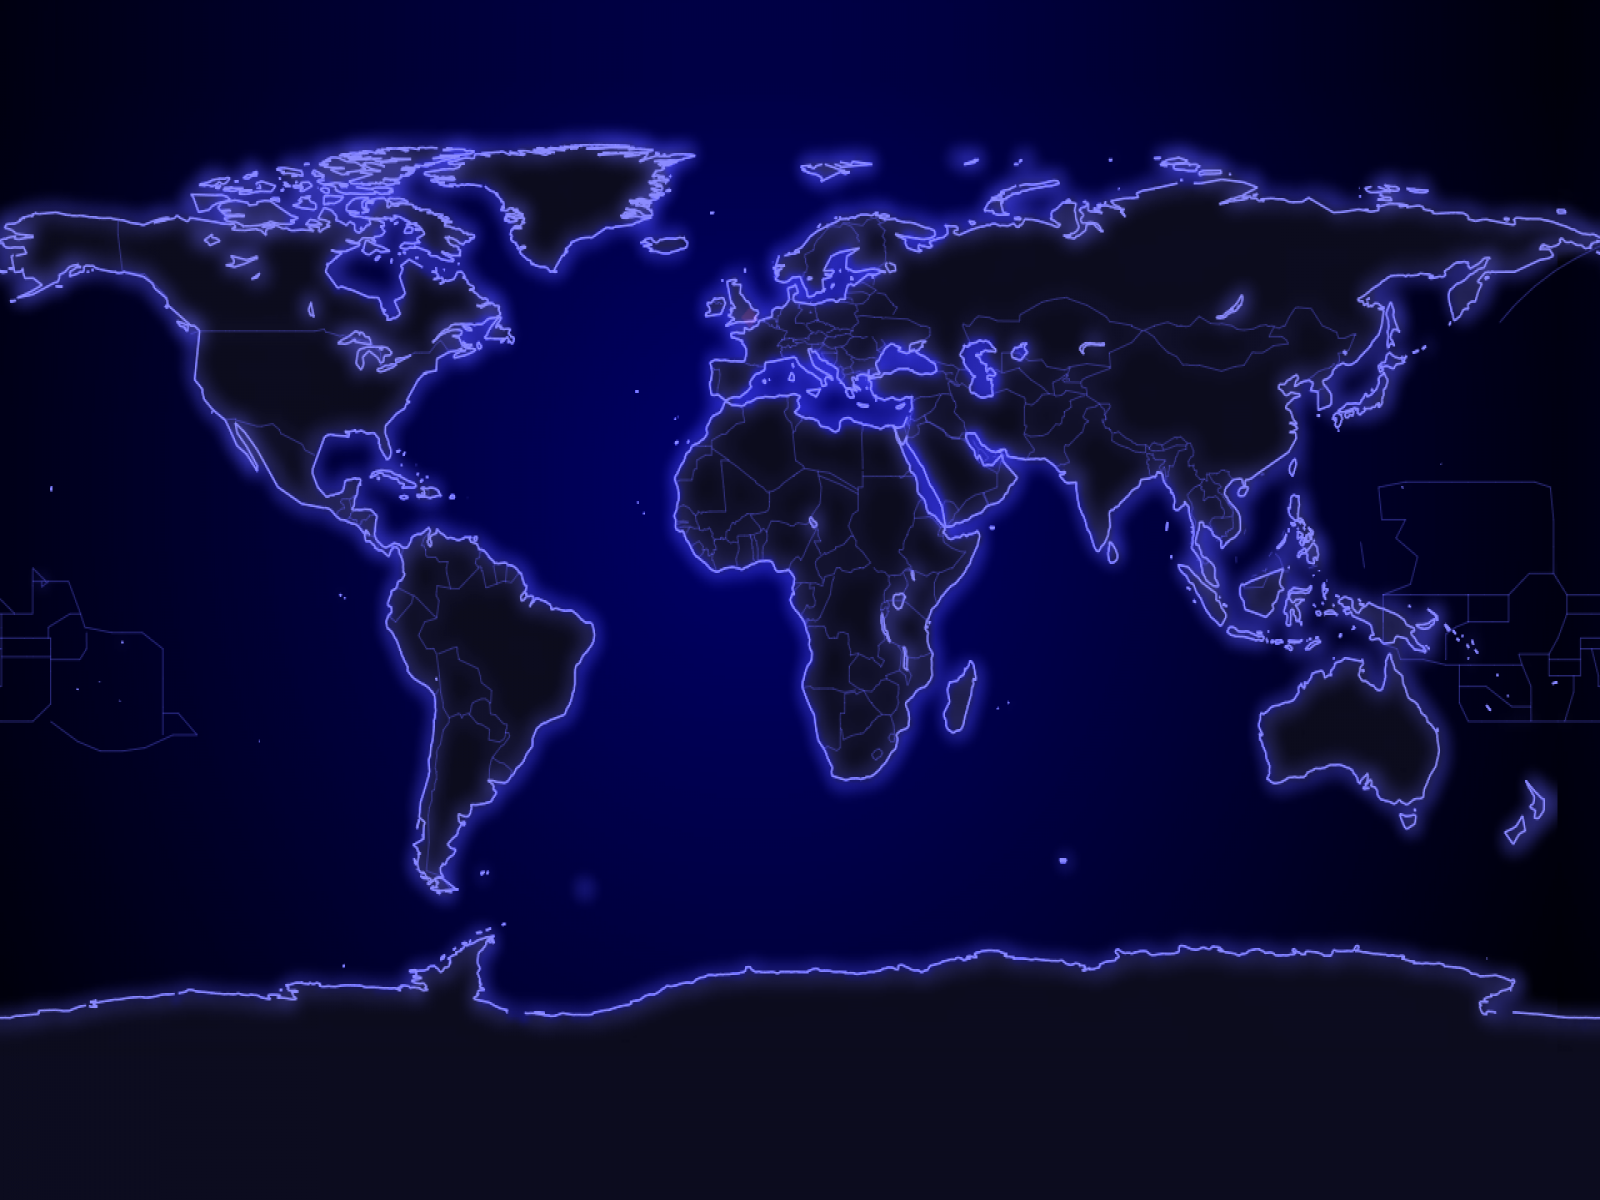 Us map wallpaper desktop wallpapersafari 1600 x 1200 world map desktop wallpaper hd backgroundjpg 1600x1200 gumiabroncs Choice Image